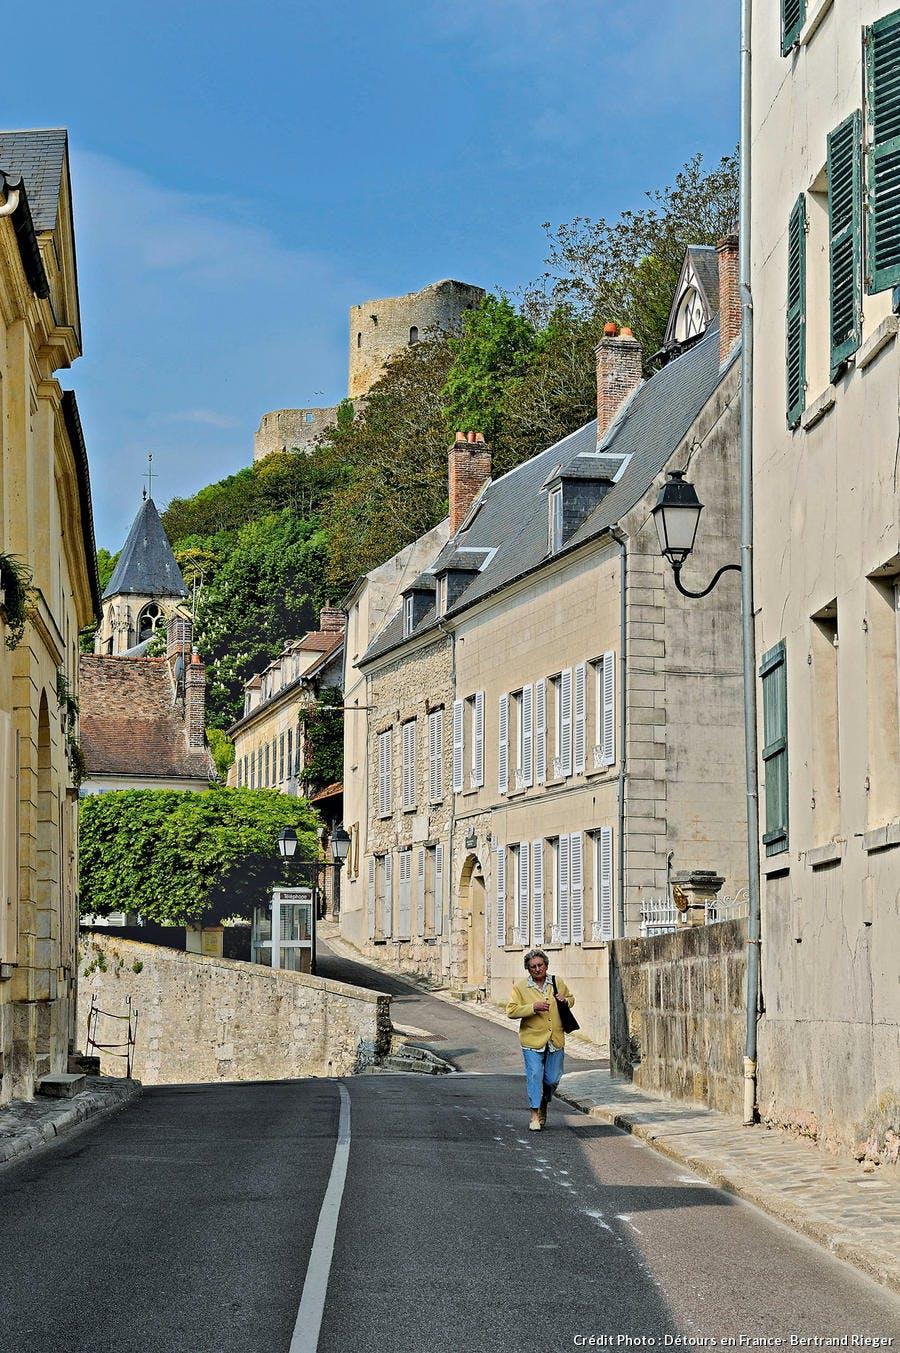 Route menant au chateau de la roche guyon